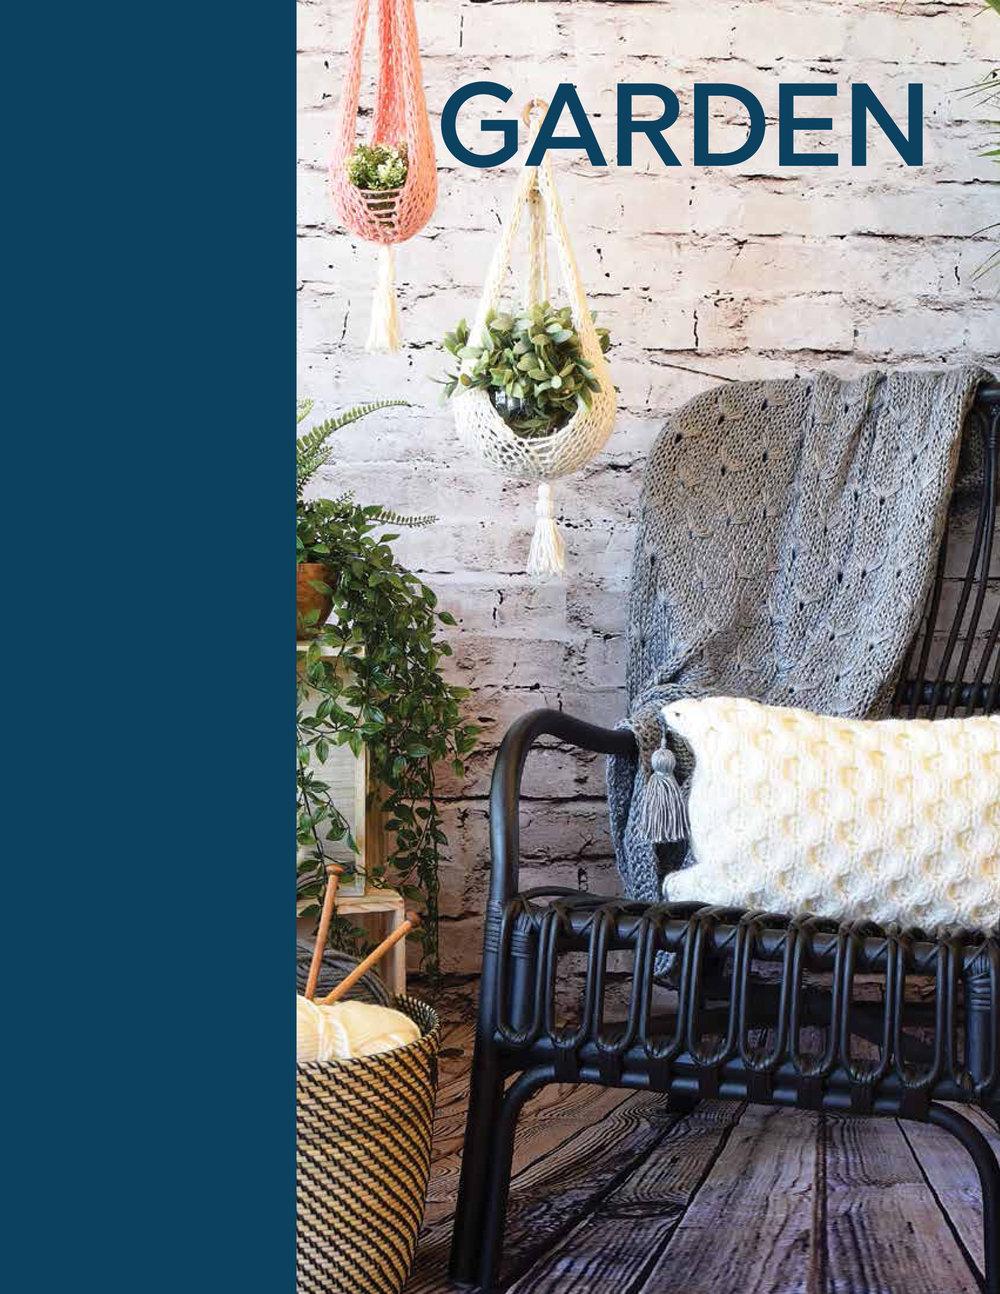 Garden - Dandelion ThrowHoneycomb CushionTerrarium Sling